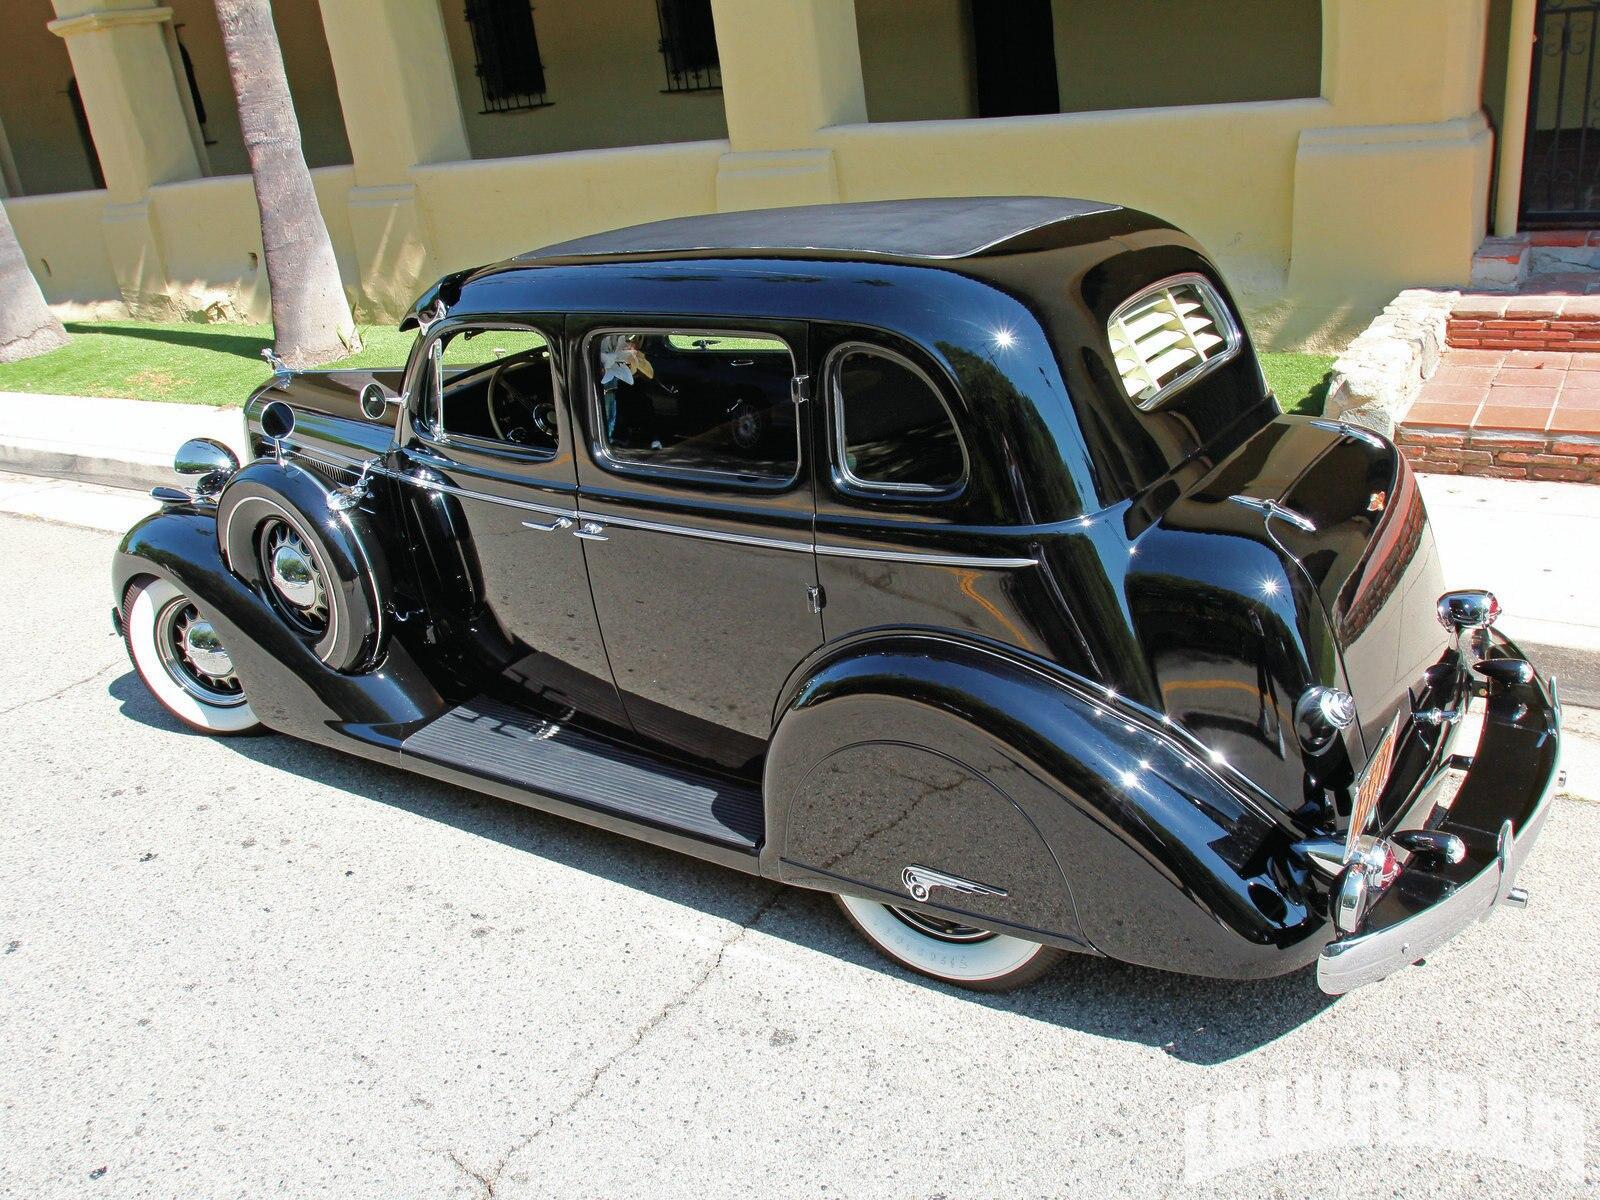 1935 Dodge Touring Sedan - Lowrider Magazine